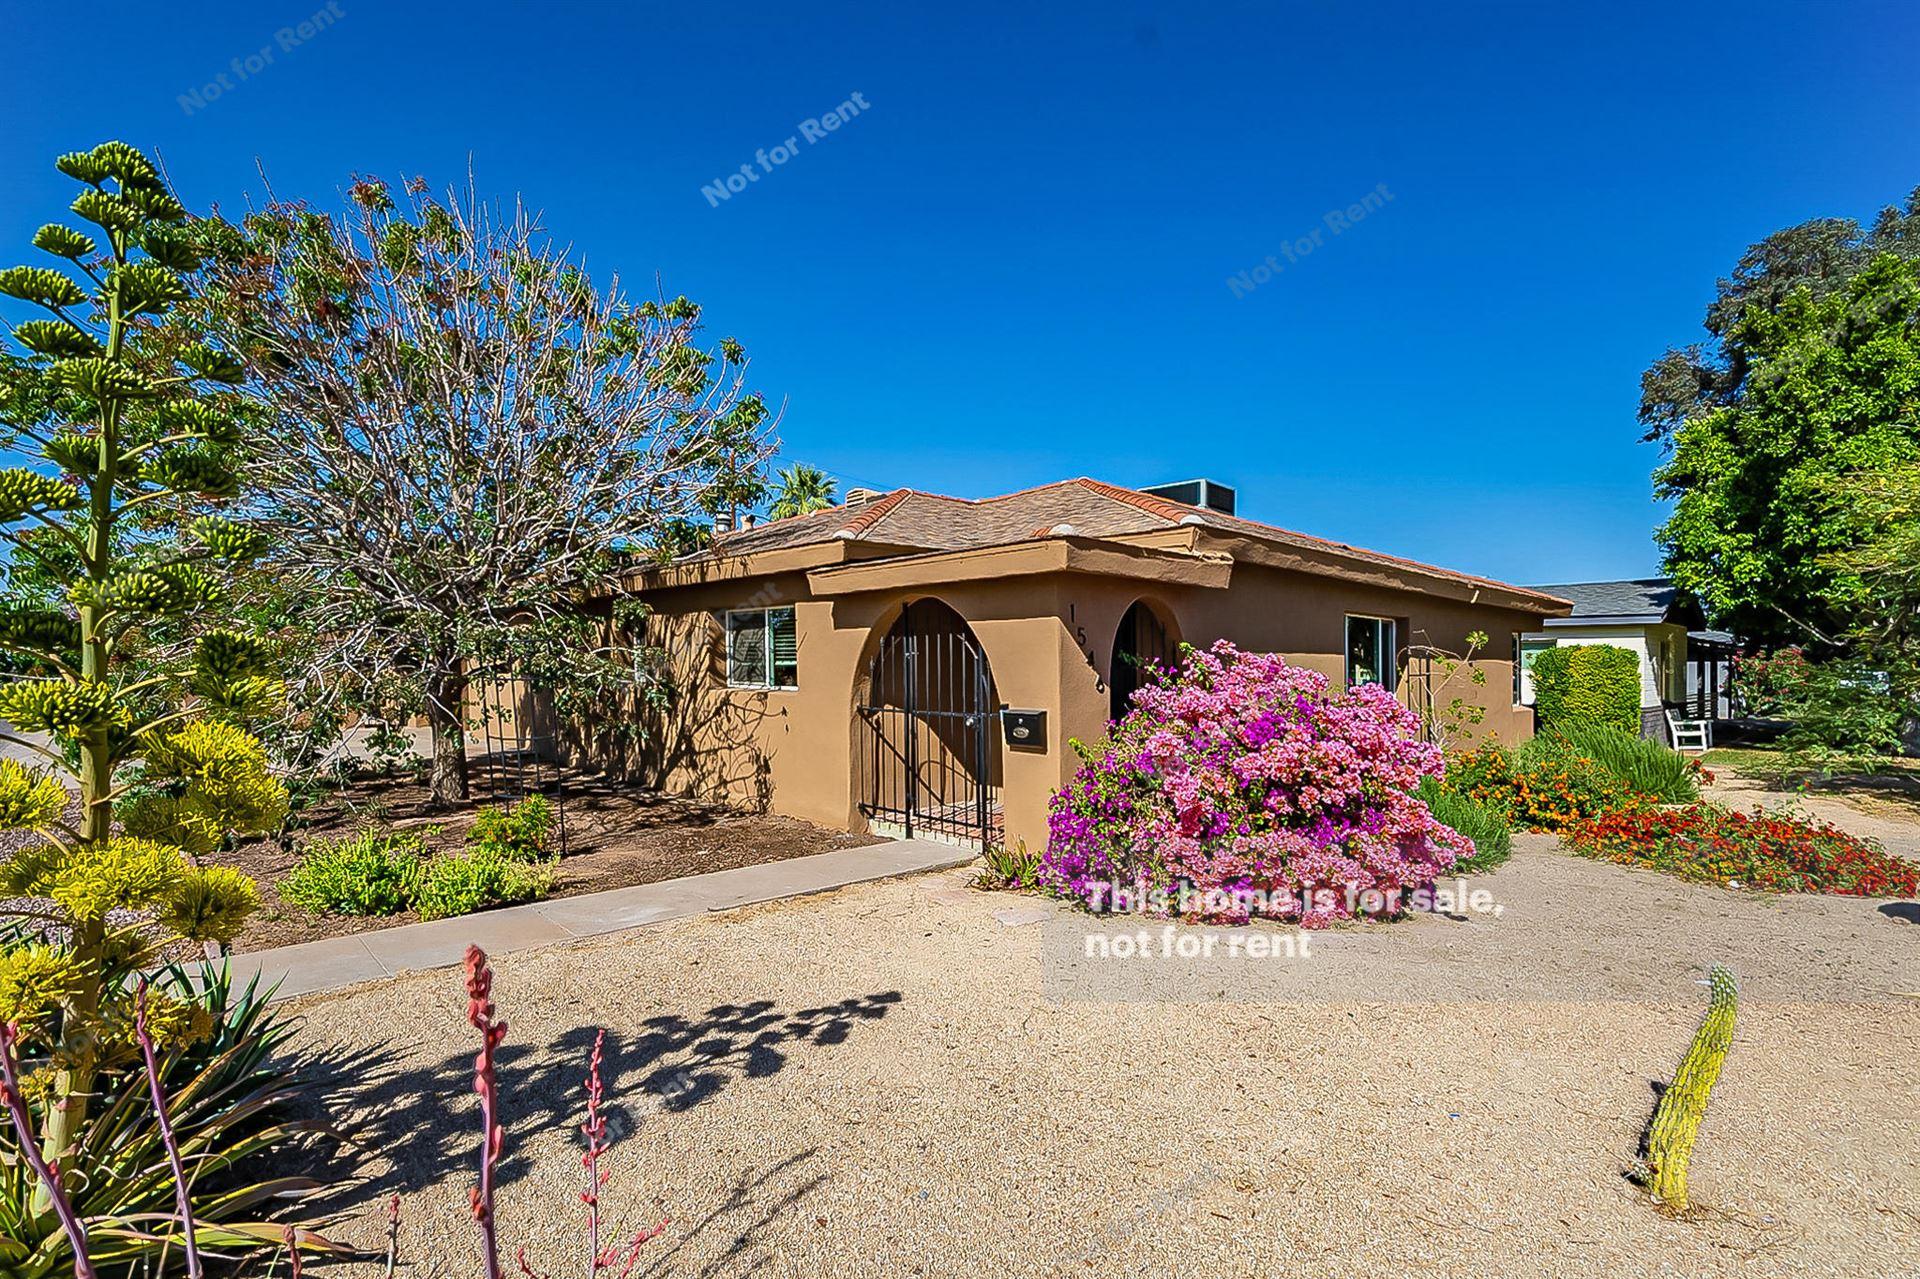 1546 W FAIRMOUNT Avenue, Phoenix, AZ 85015 - MLS#: 6220773